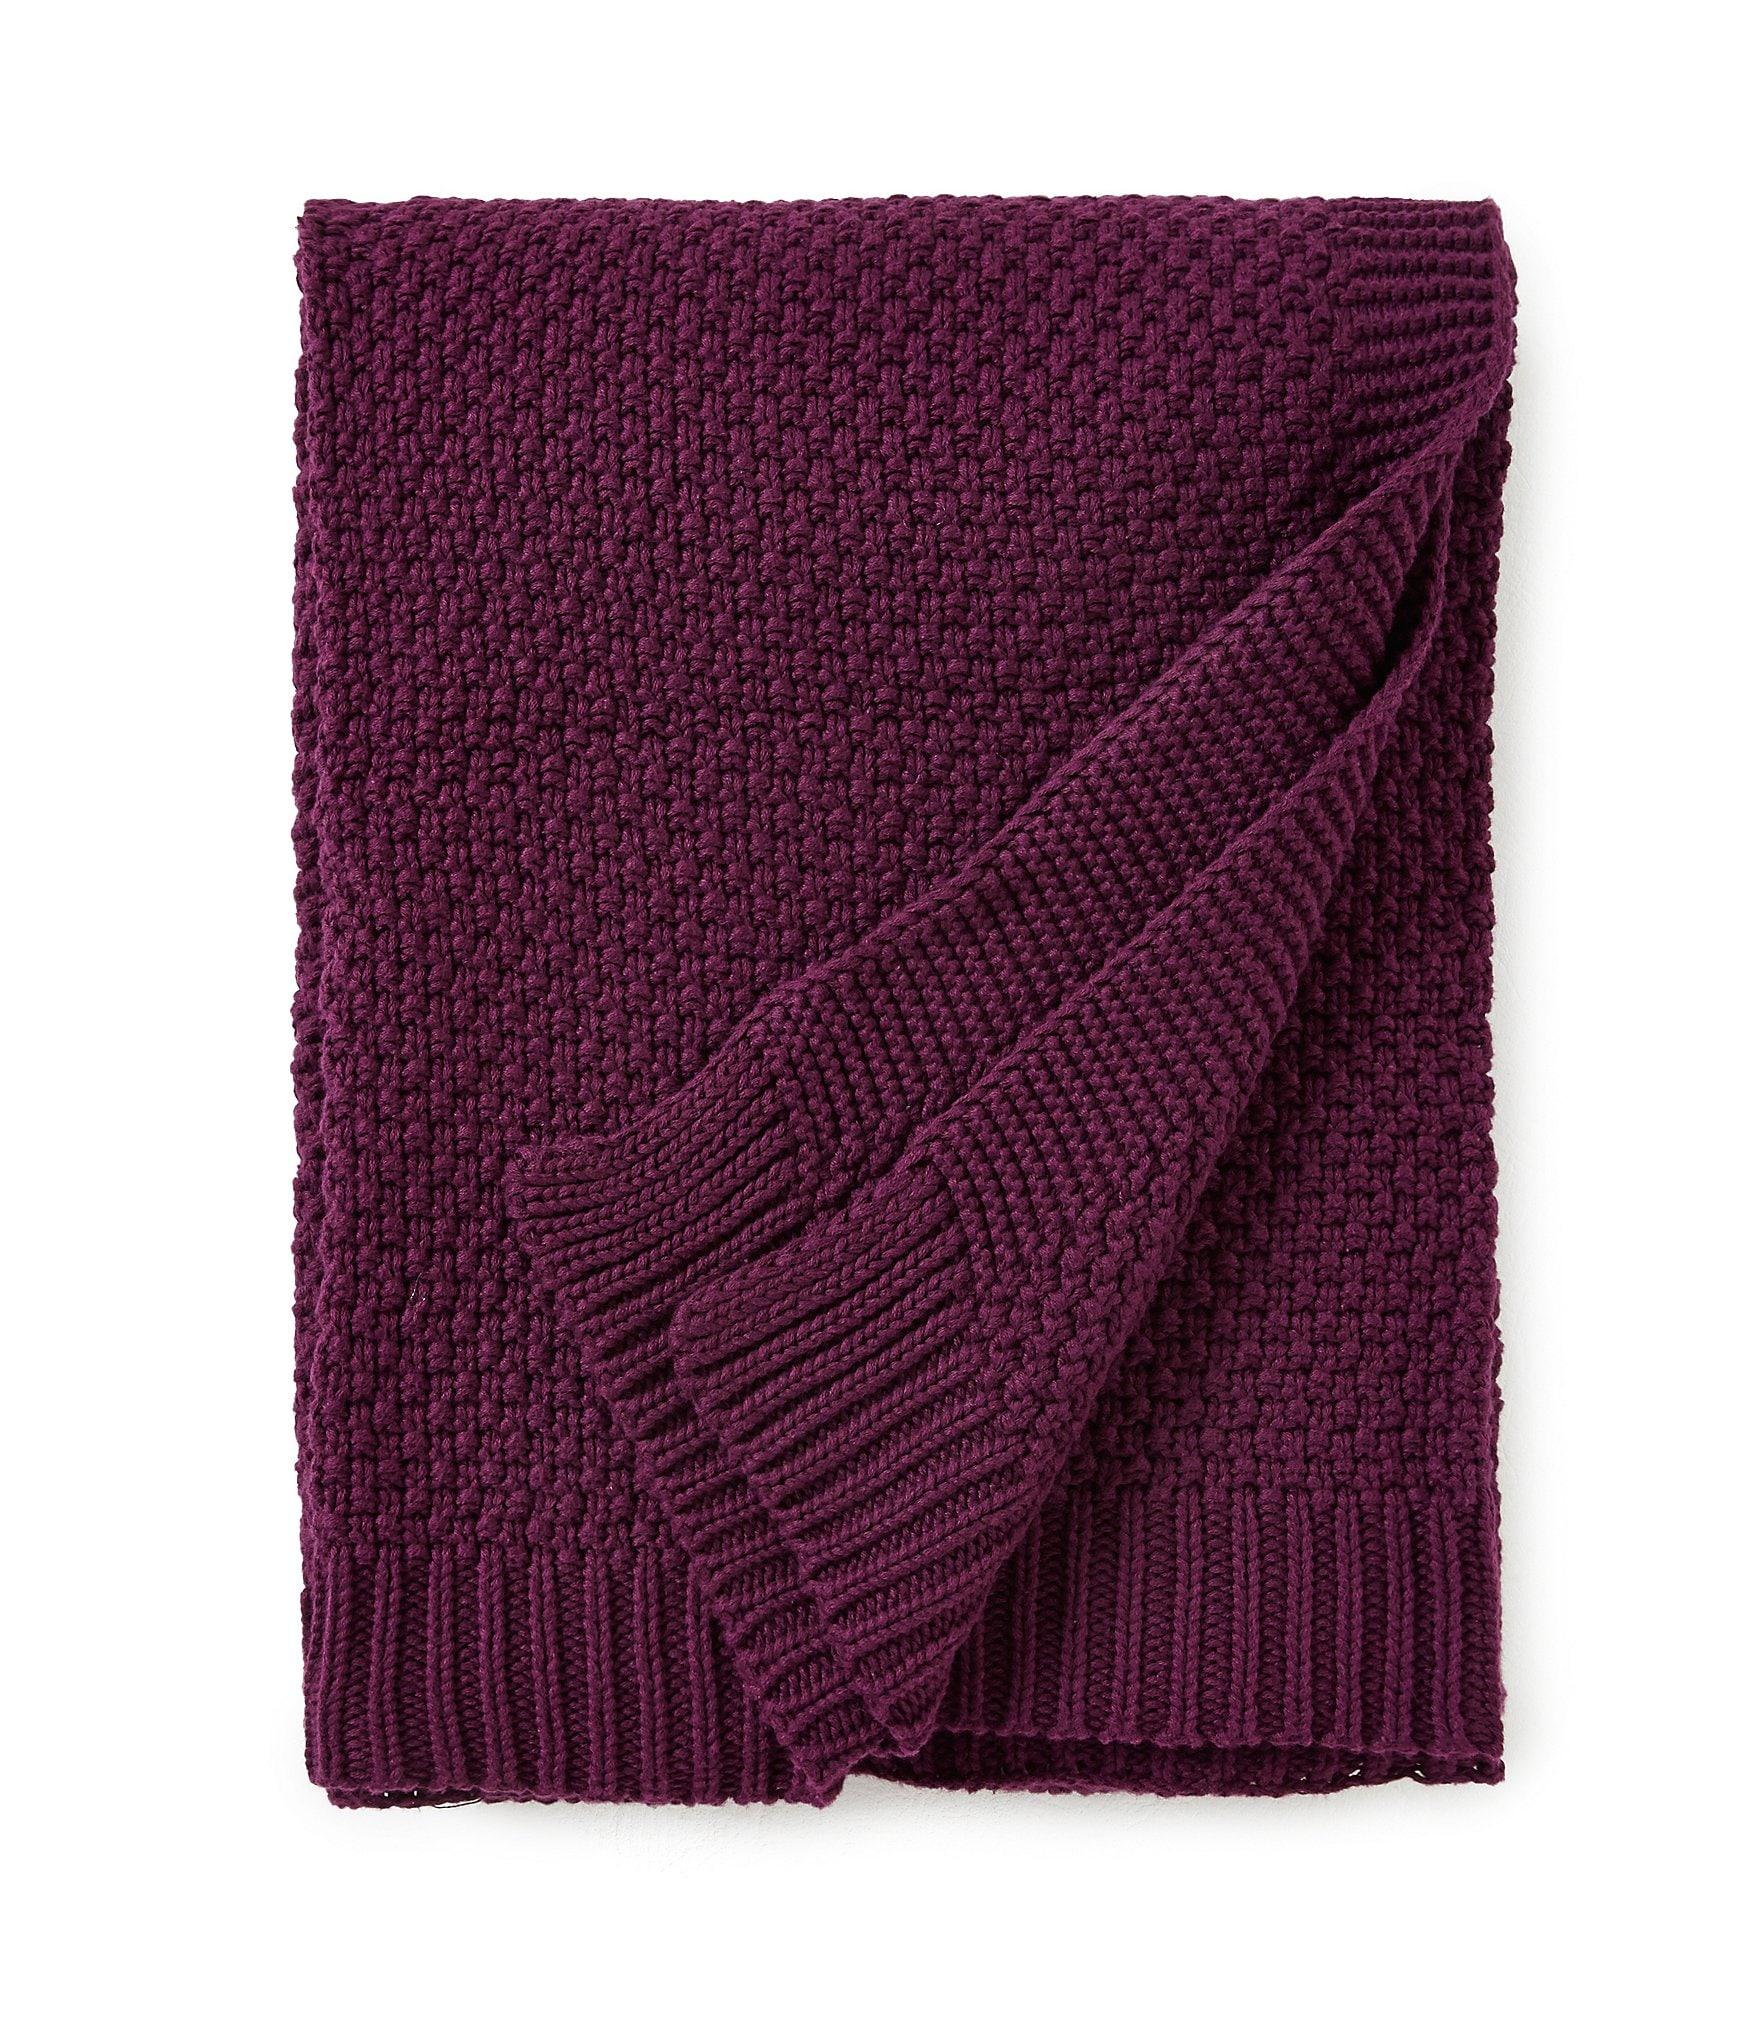 home  bedding  blankets  decorative throws  dillardscom -